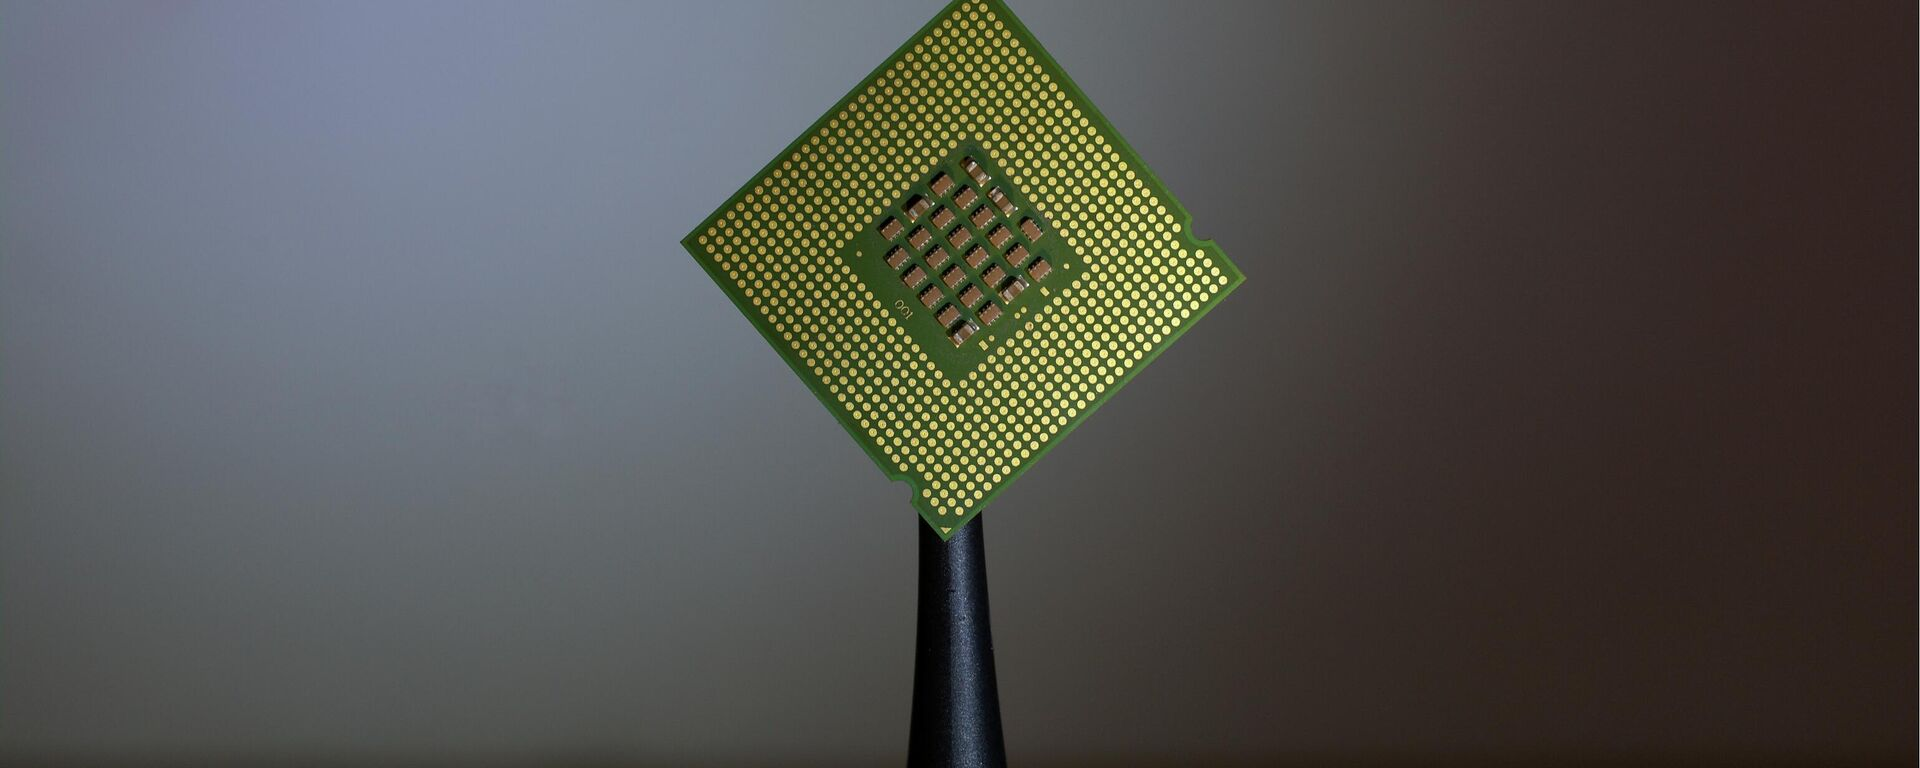 The Computer Chip - Sputnik Mundo, 1920, 07.06.2021